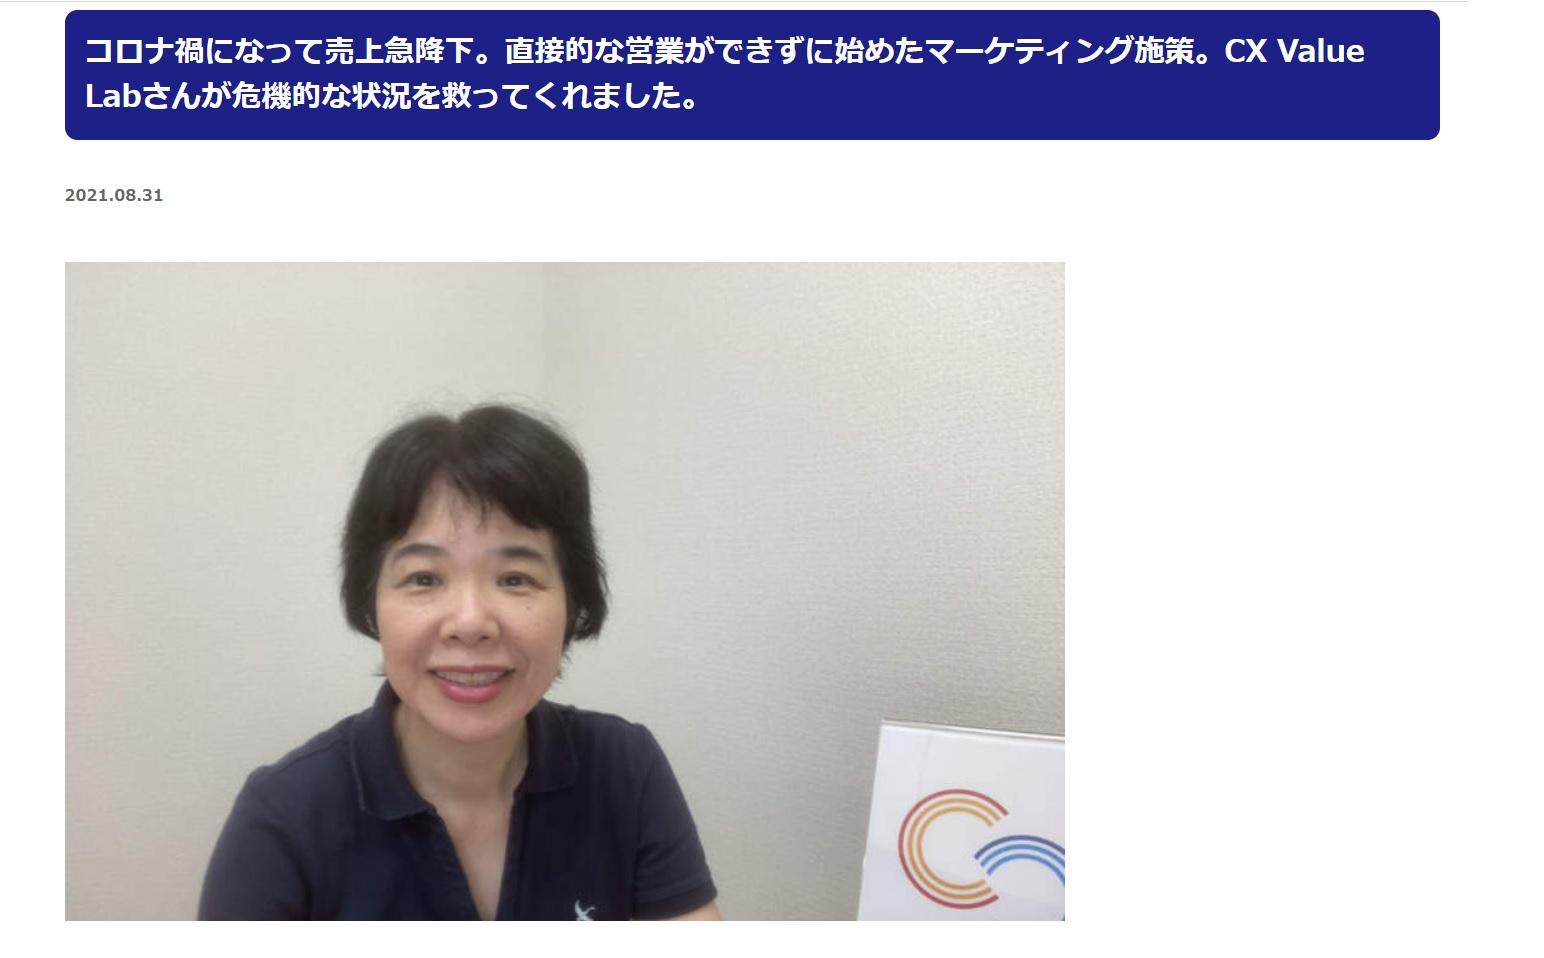 DX推進の取り組みついて②(CX Value Lab株式会社様HP掲載)